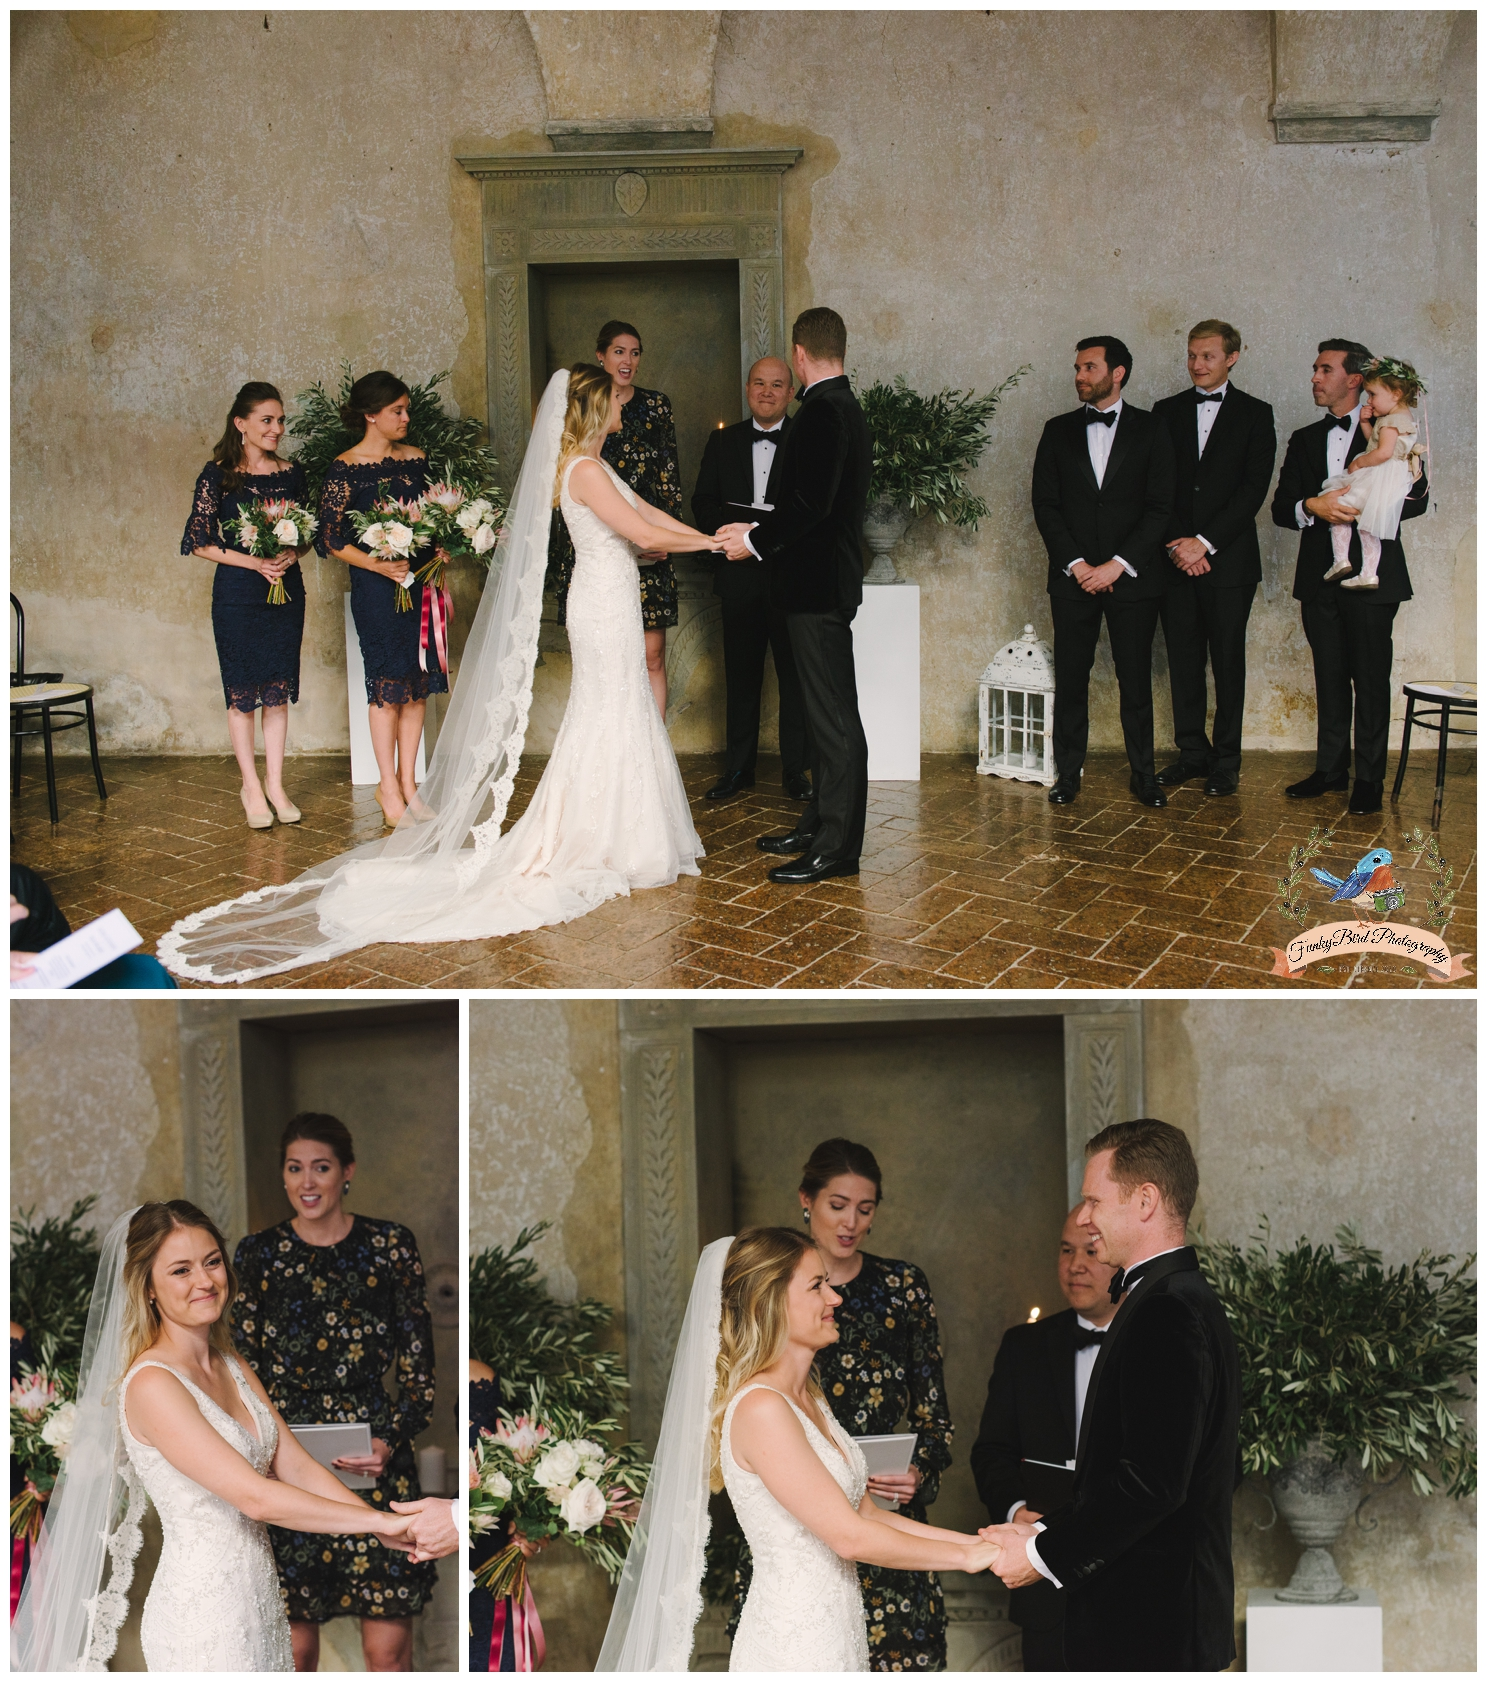 Wedding_Photographer_Tuscany_Italy_0028.jpg